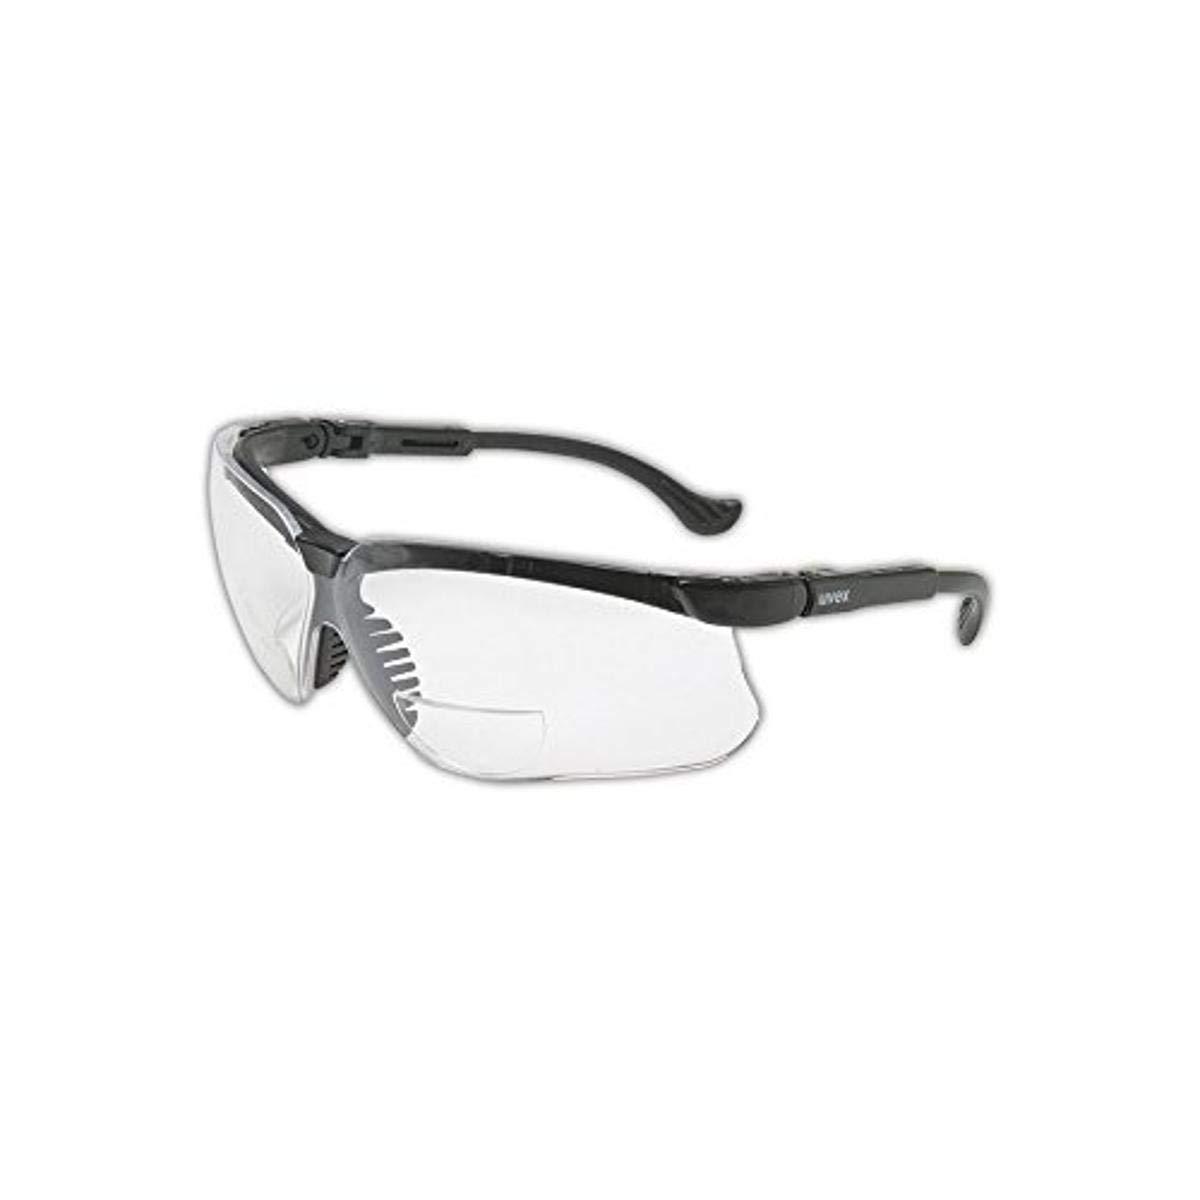 Honeywell S3762 Uvex Max 71% OFF Genuine Genesis Series Glasses Reader Safety Style